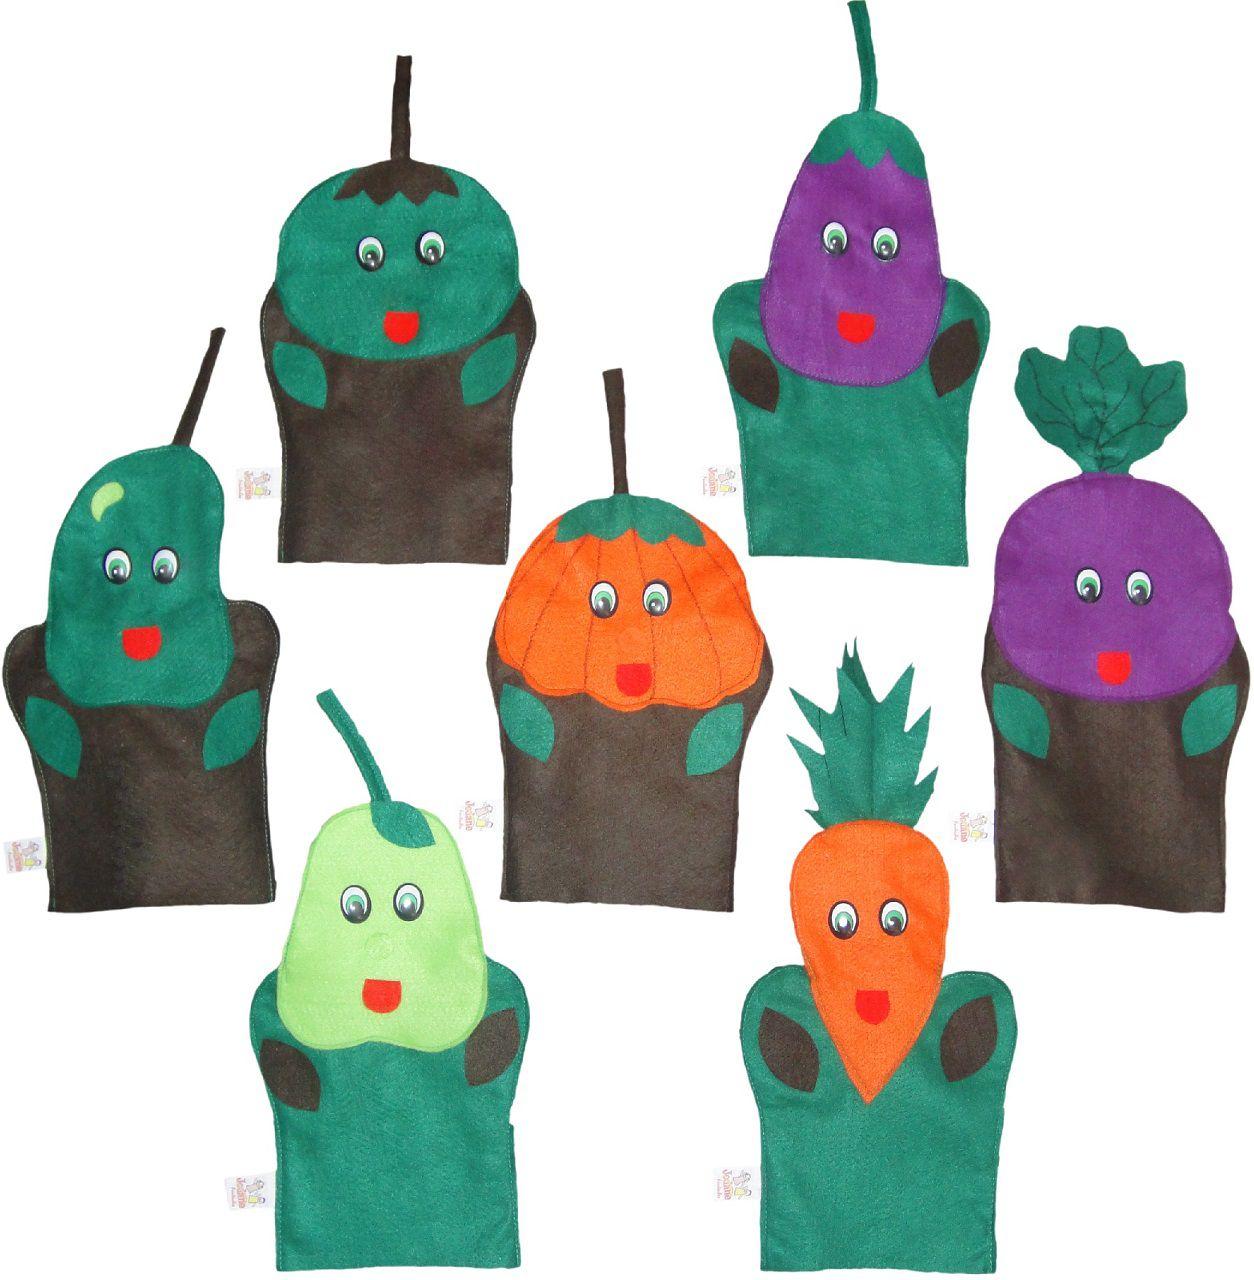 Fantoches em Feltro Legumes - 7 Peças - Jodane 1018